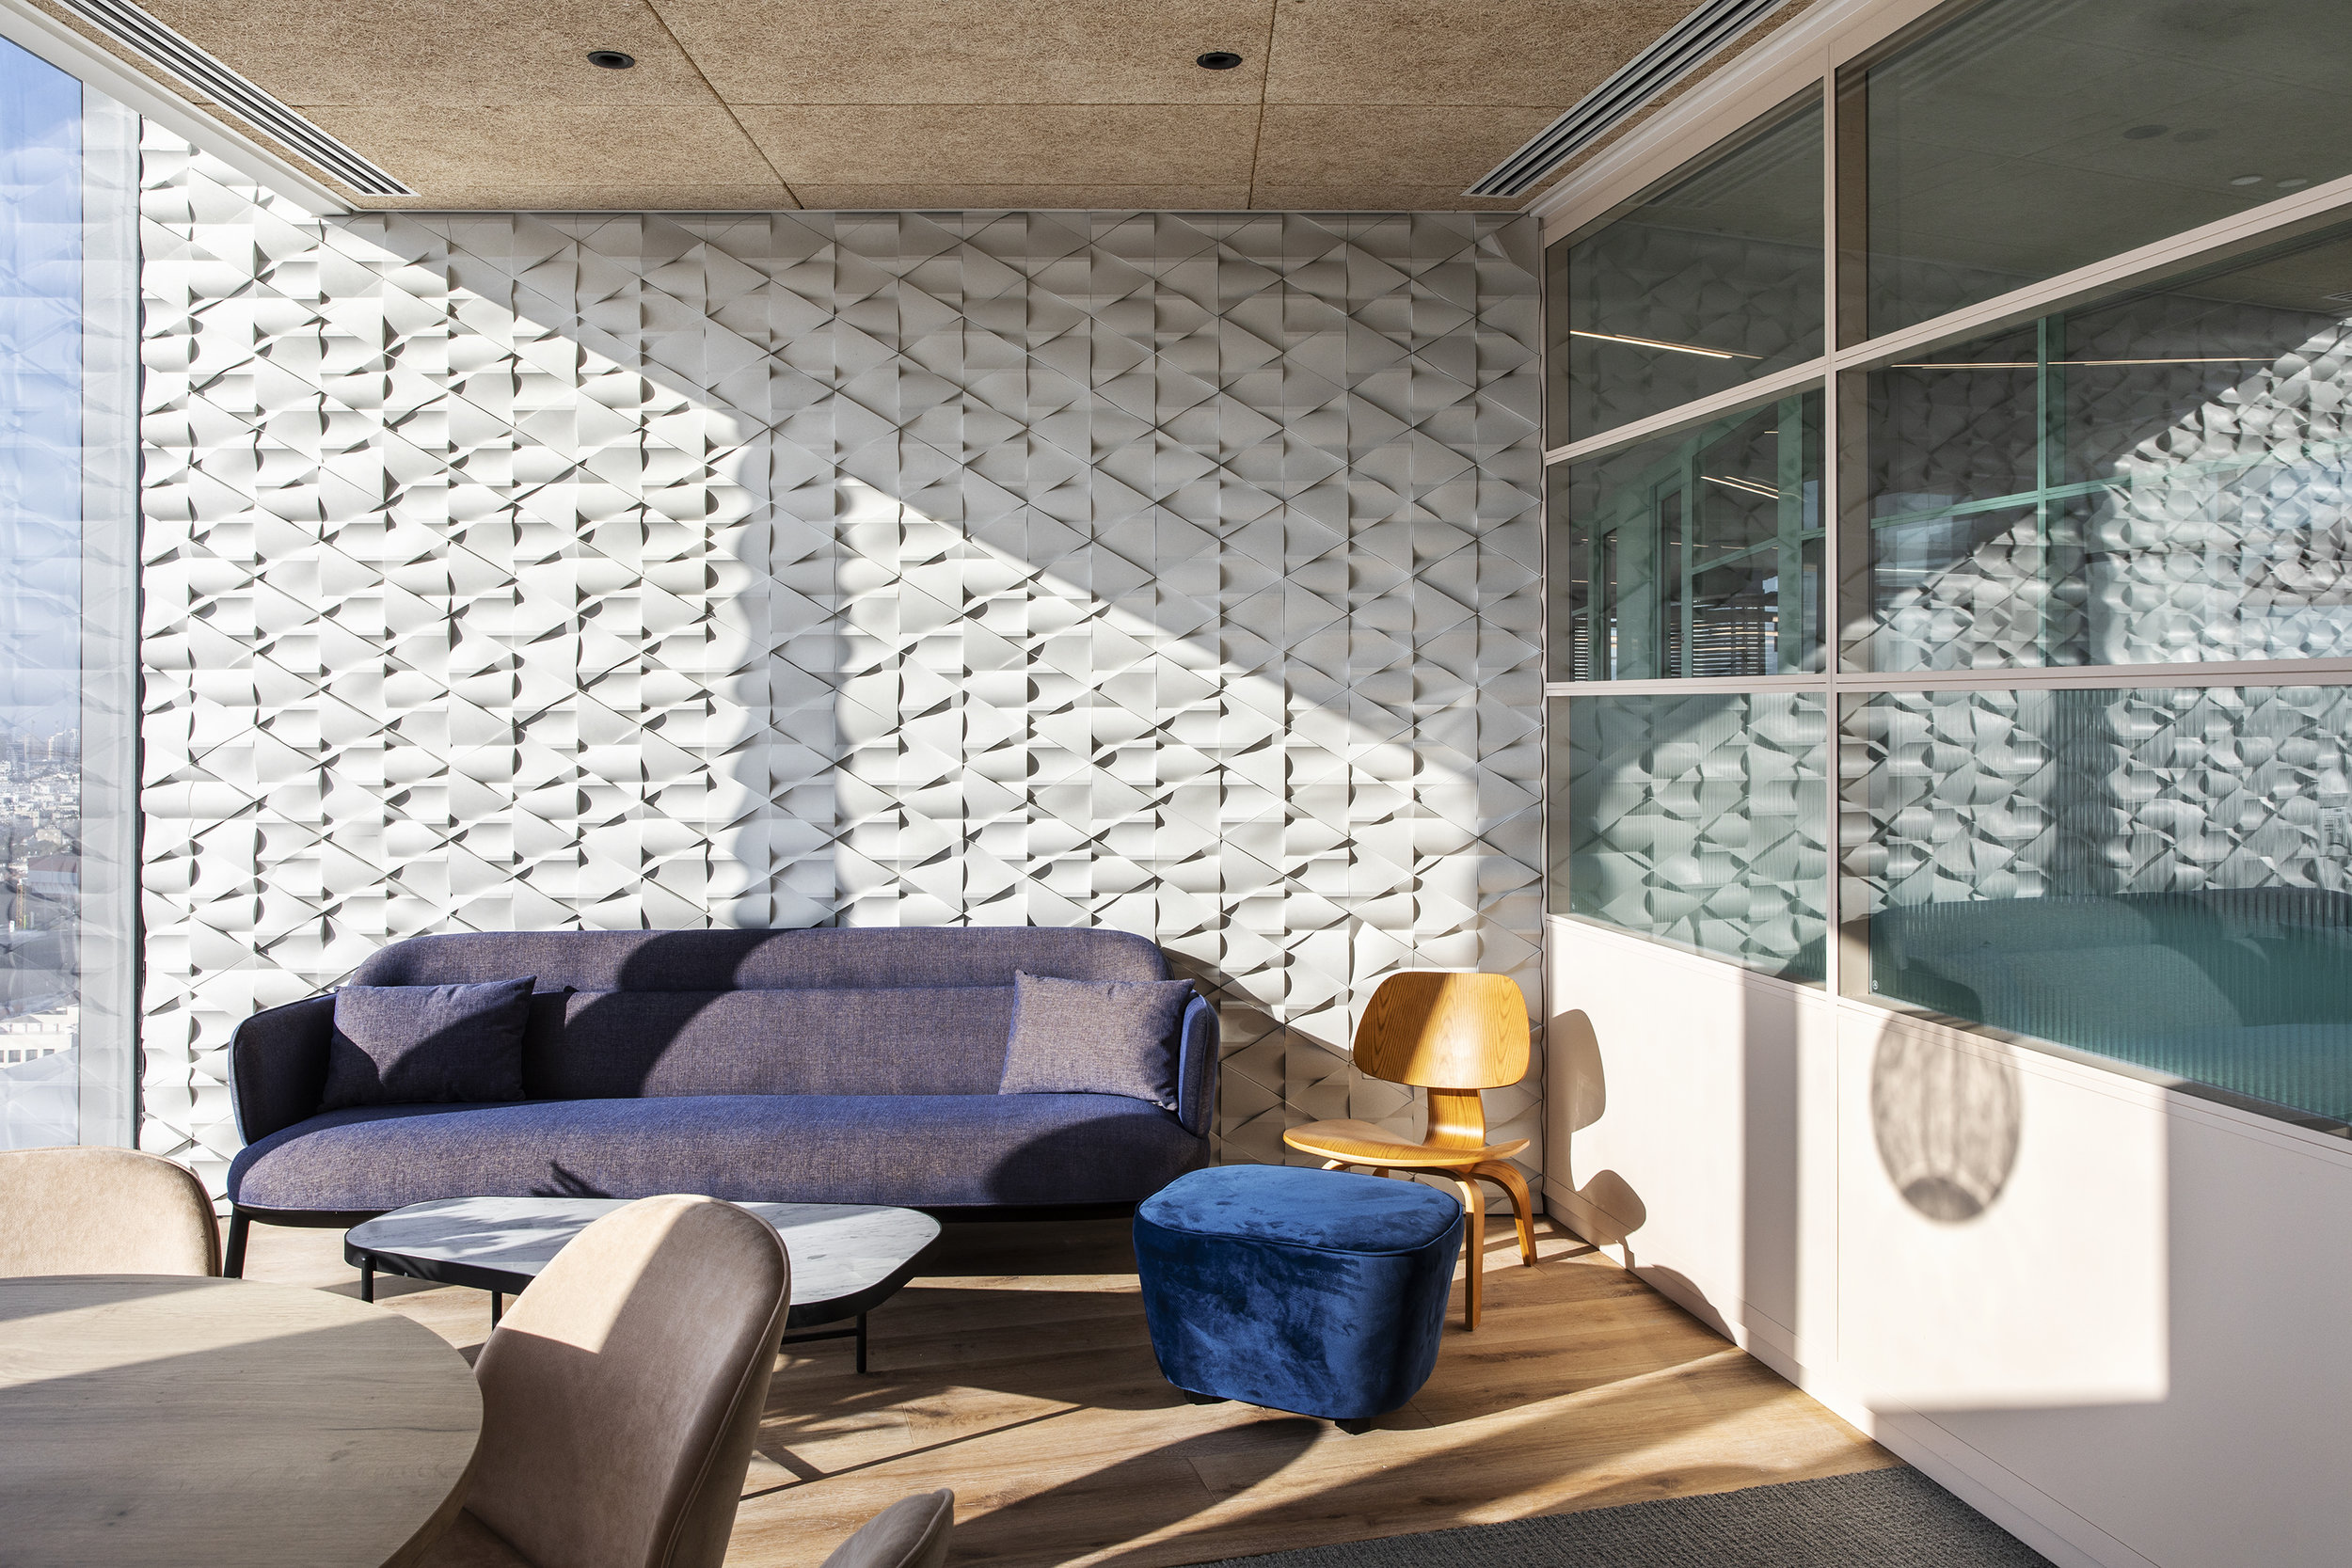 רואי דוד אדריכלות - אדריכל - נטורל אינטליג'נס - ROY DAVID - ARCHITECTURE - ARCHITECT - NI (102).jpg